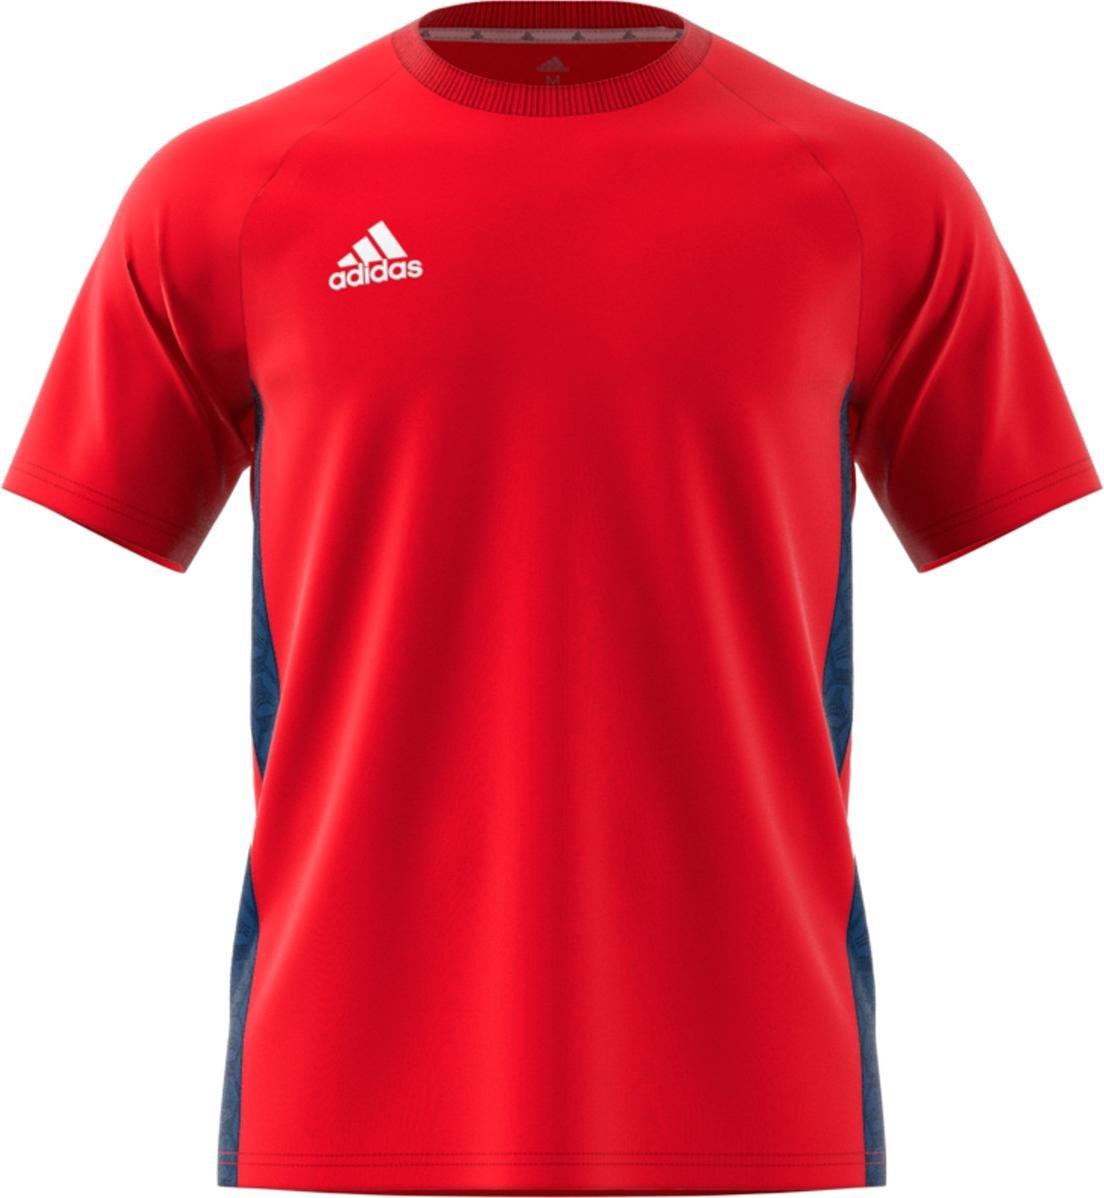 Insatisfactorio navegación Comprimir  T-shirt adidas TAN Tape TEE - Top4Running.com